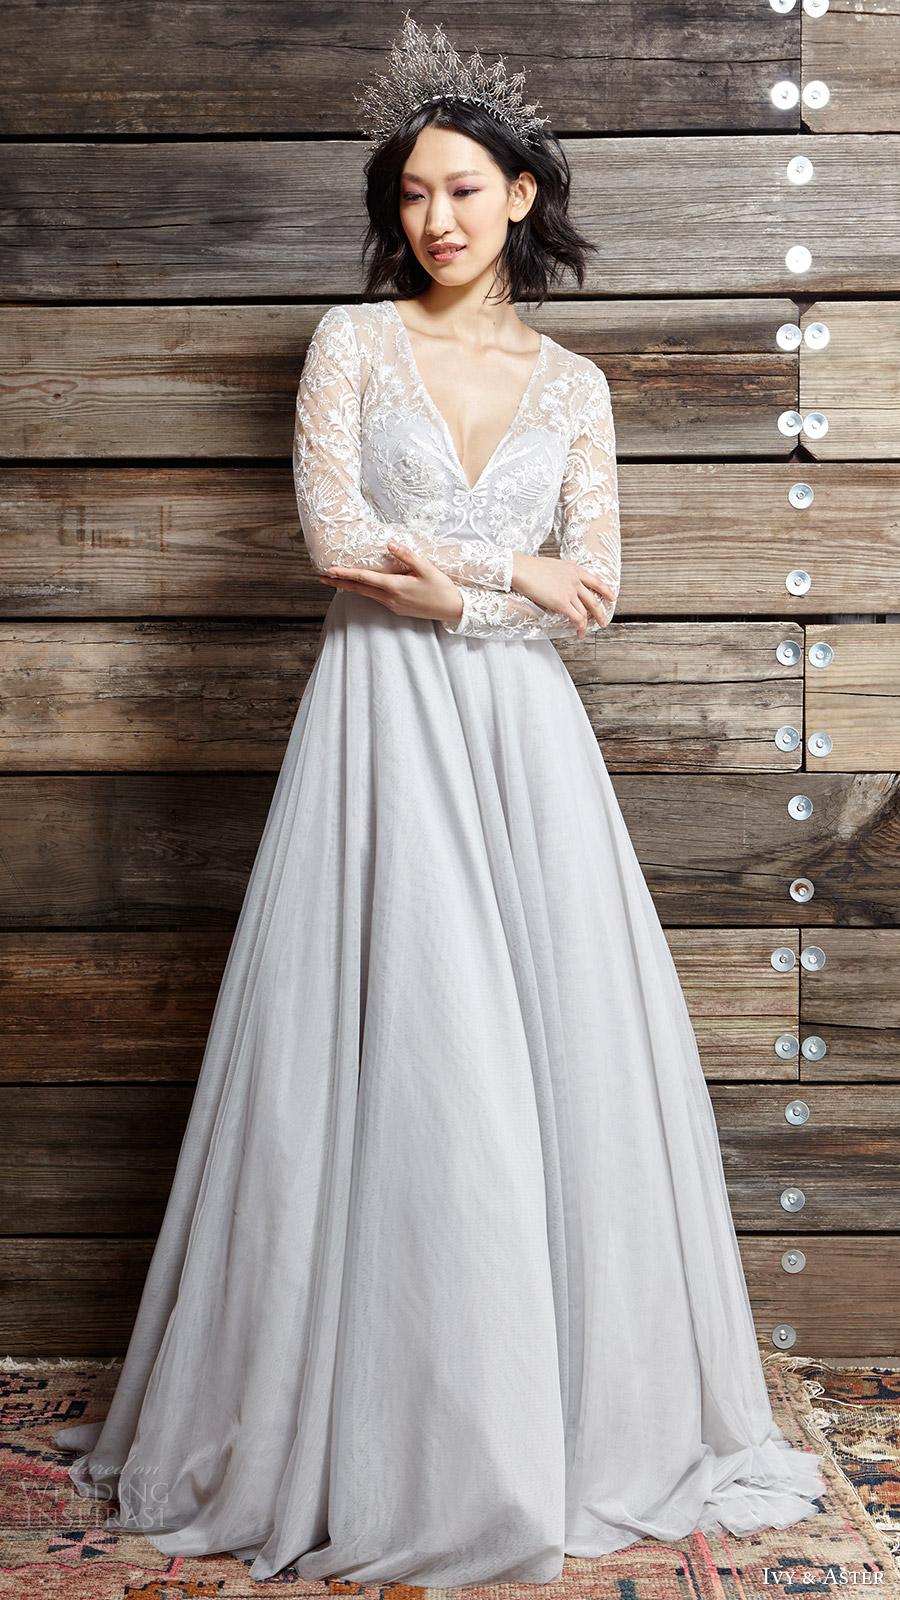 ivy aster bridal spring 2017 illusion long sleeve vneck aline wedding dress (touch of grey) mv